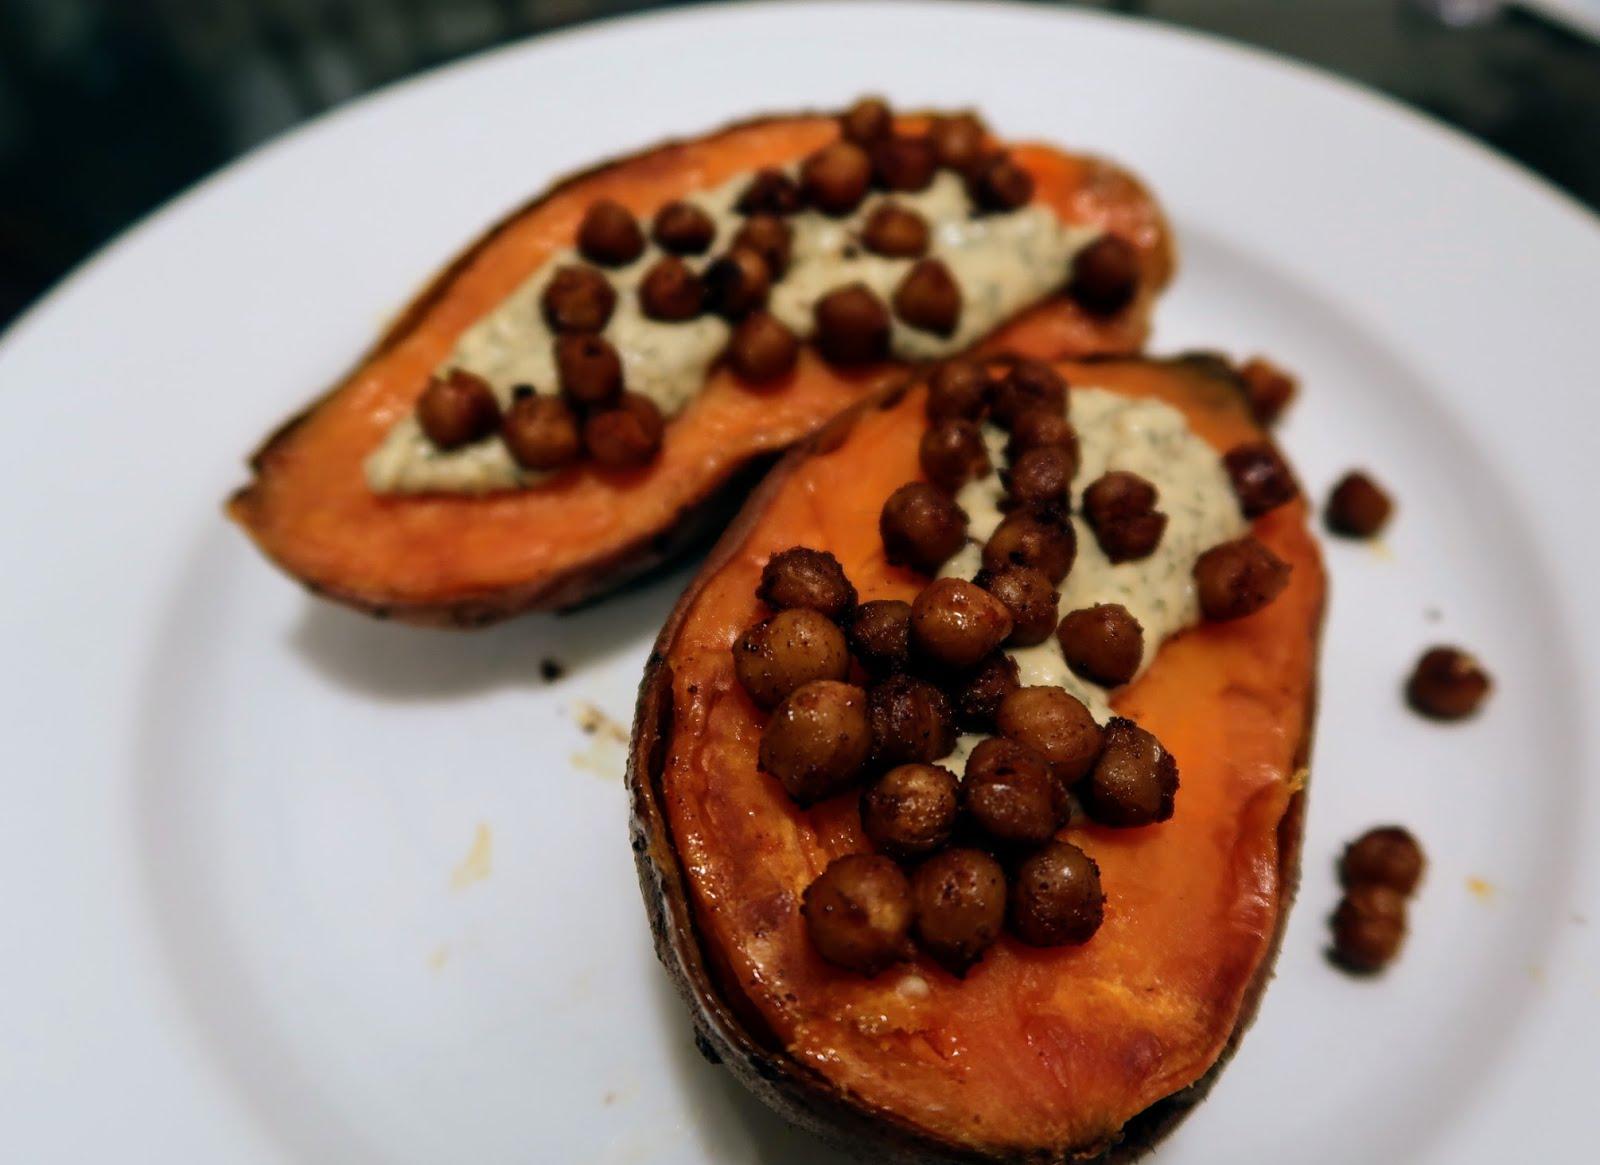 cooking diet vegan vegetarian healthy fitness new year resolution goal